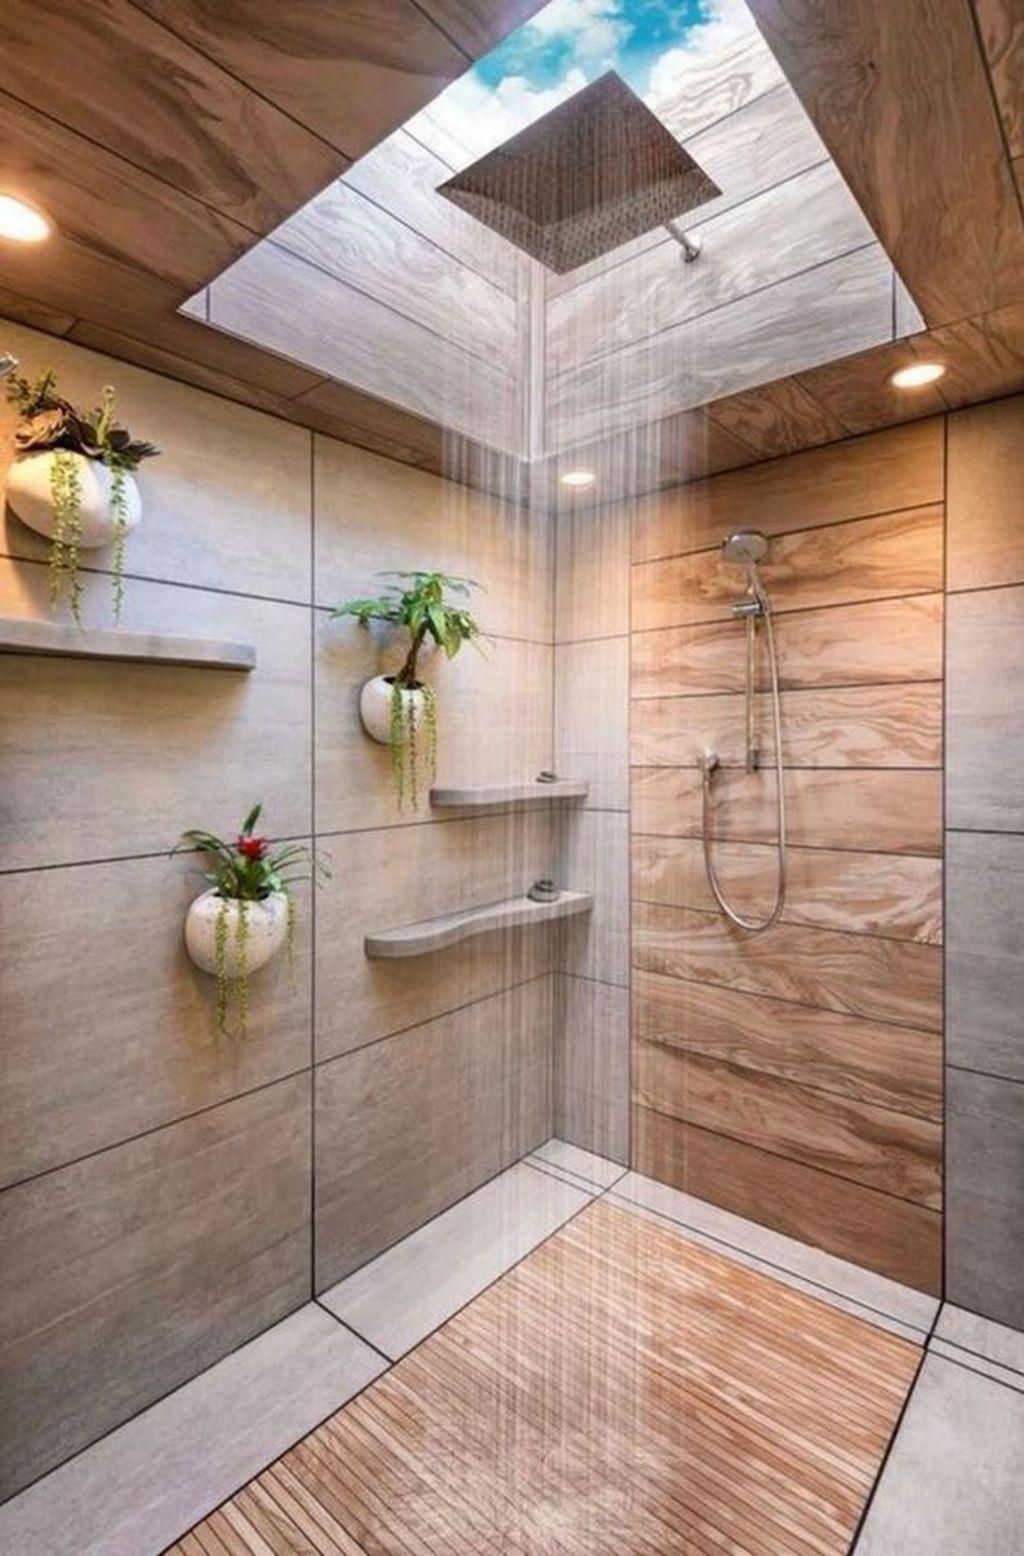 40 Stunning Bathroom Shower Design Ideas For Your Home House Bathroom Modern Bathroom Design Home